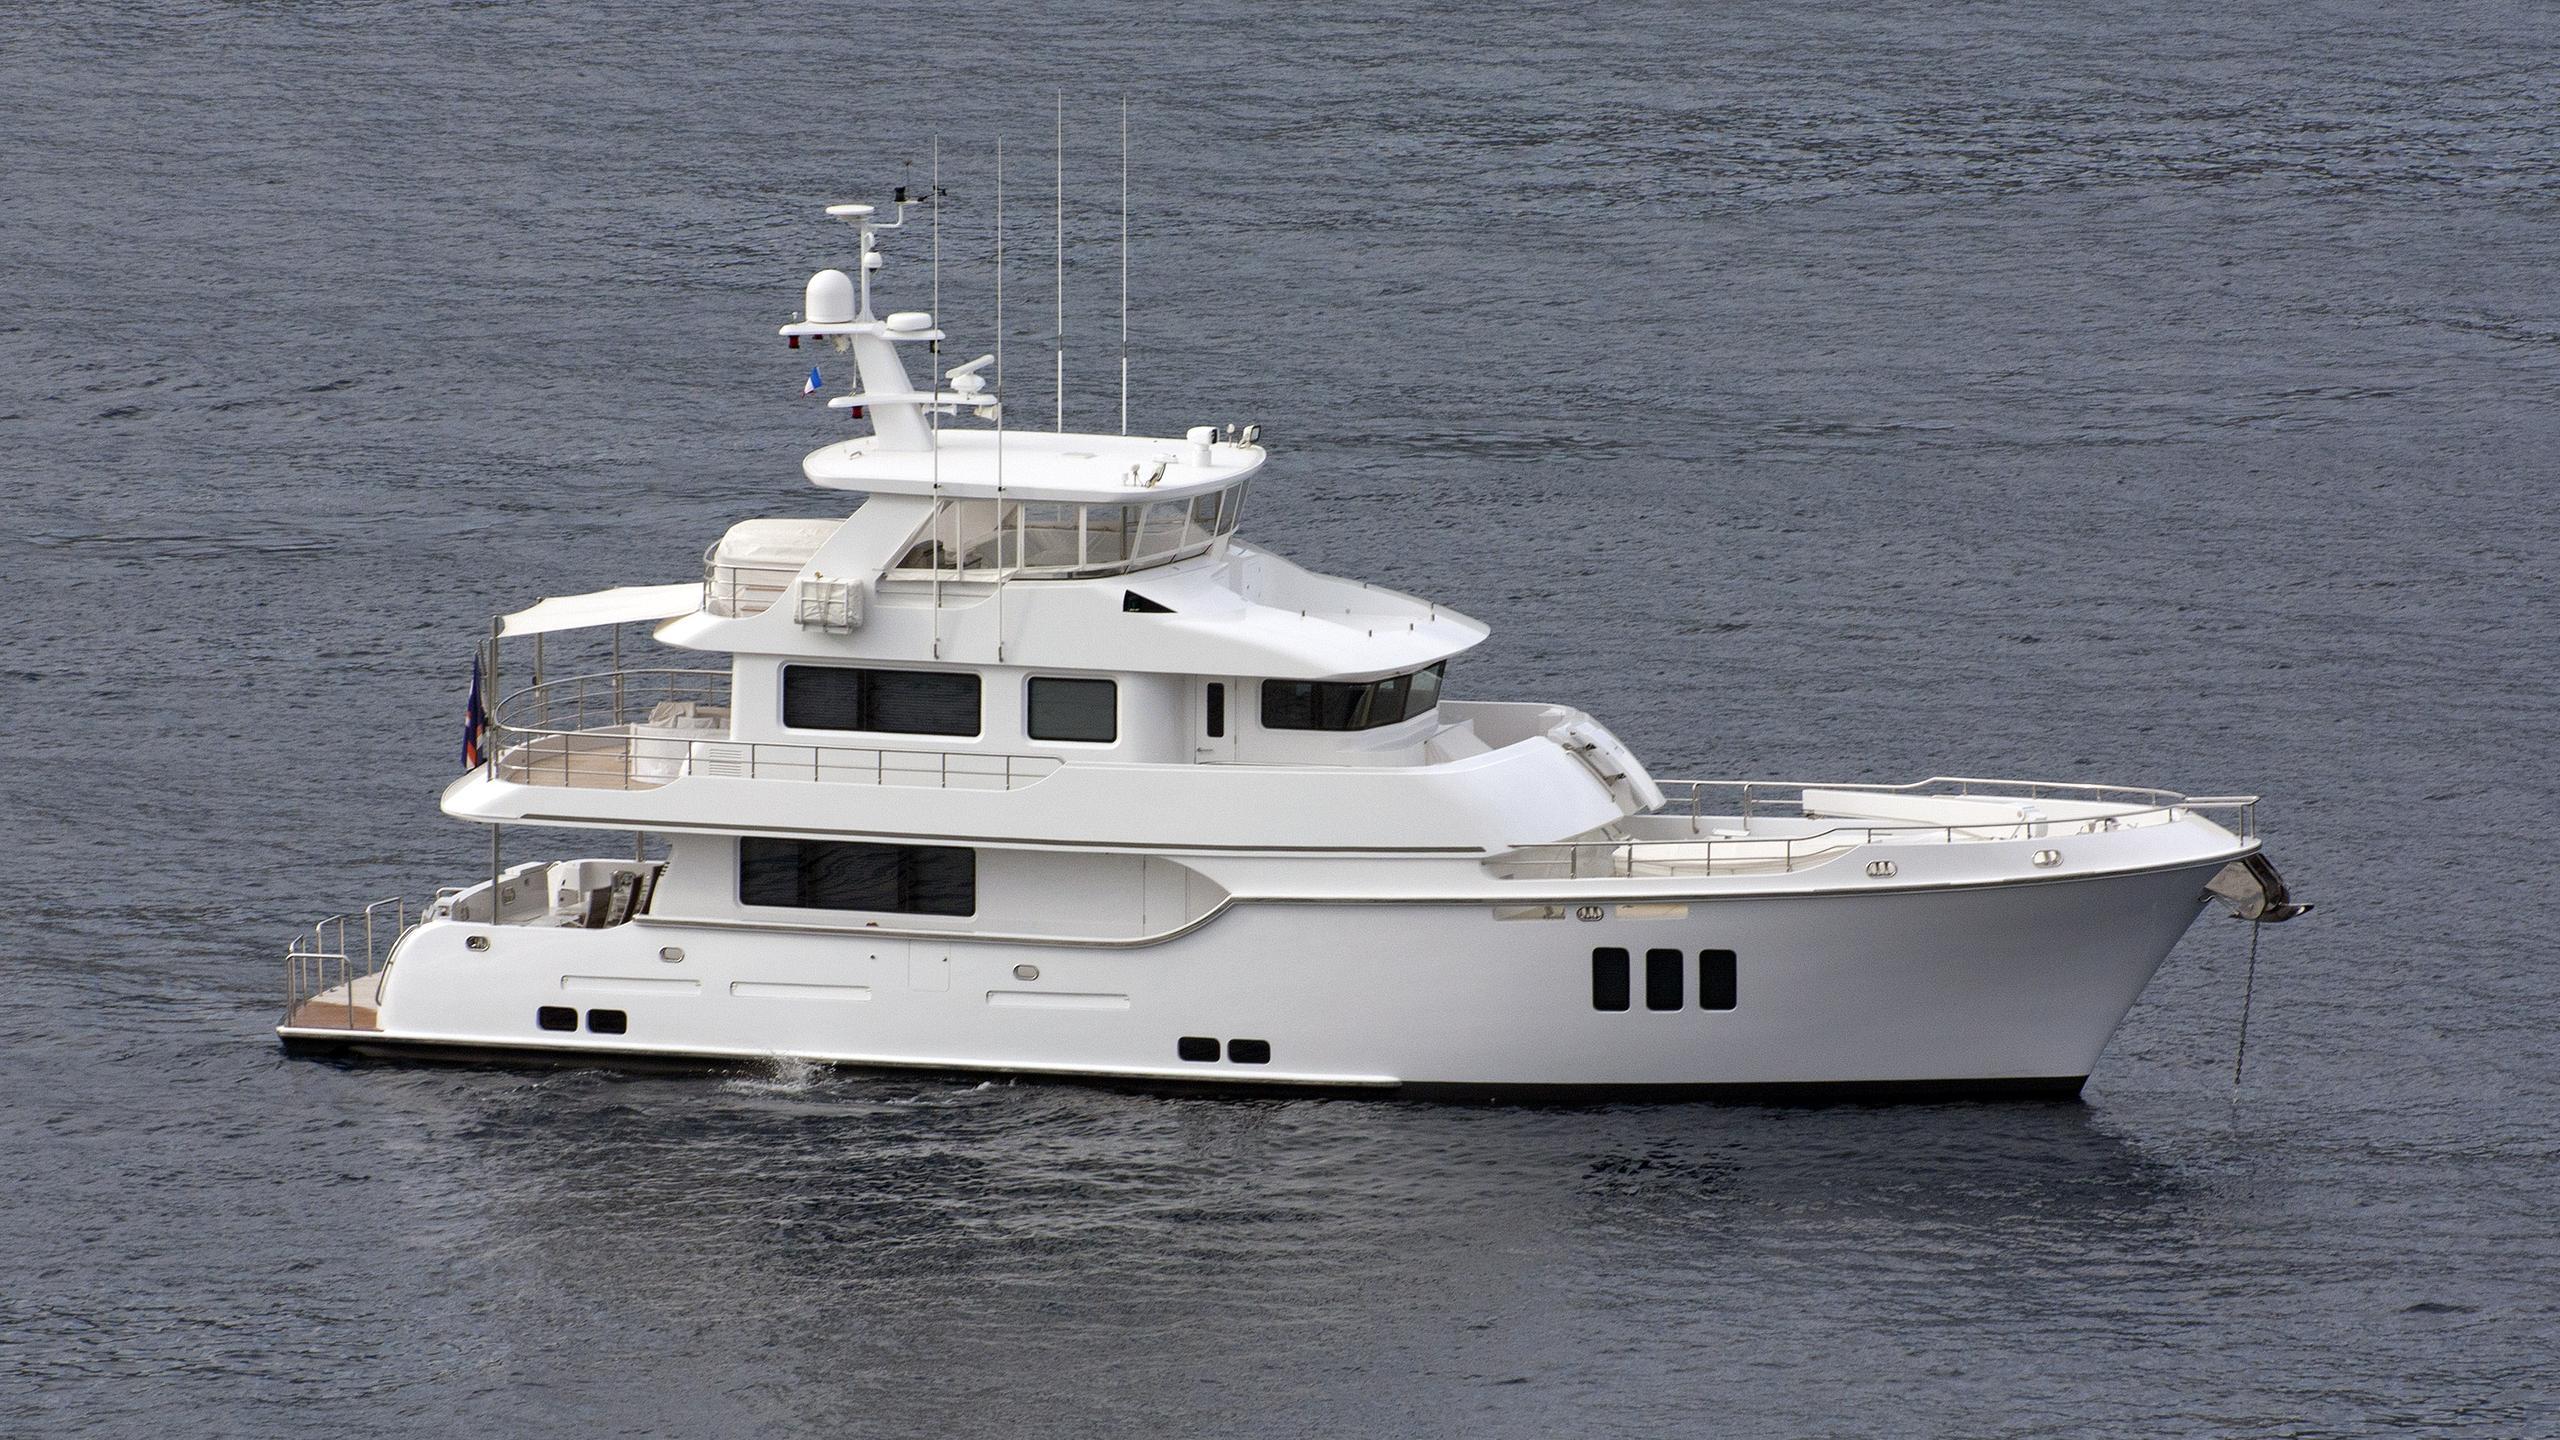 zembra-explorer-yacht-nordhavn-86-2012-27m-profile